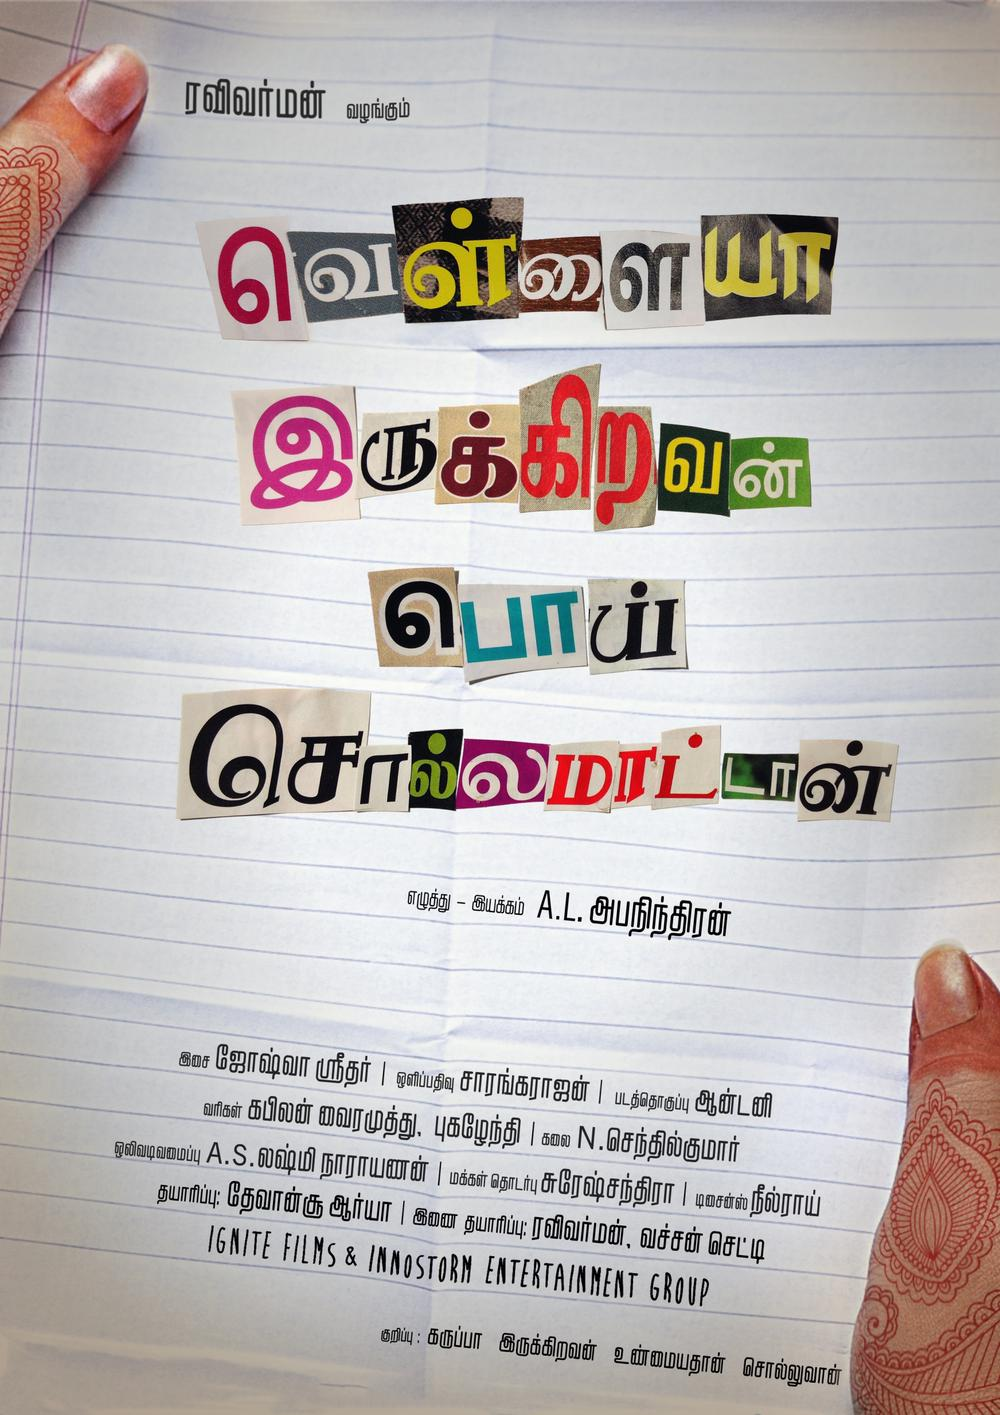 Vellaiya Irukiravan Poi Solla Maattan Movie Review Tamil Movie Review